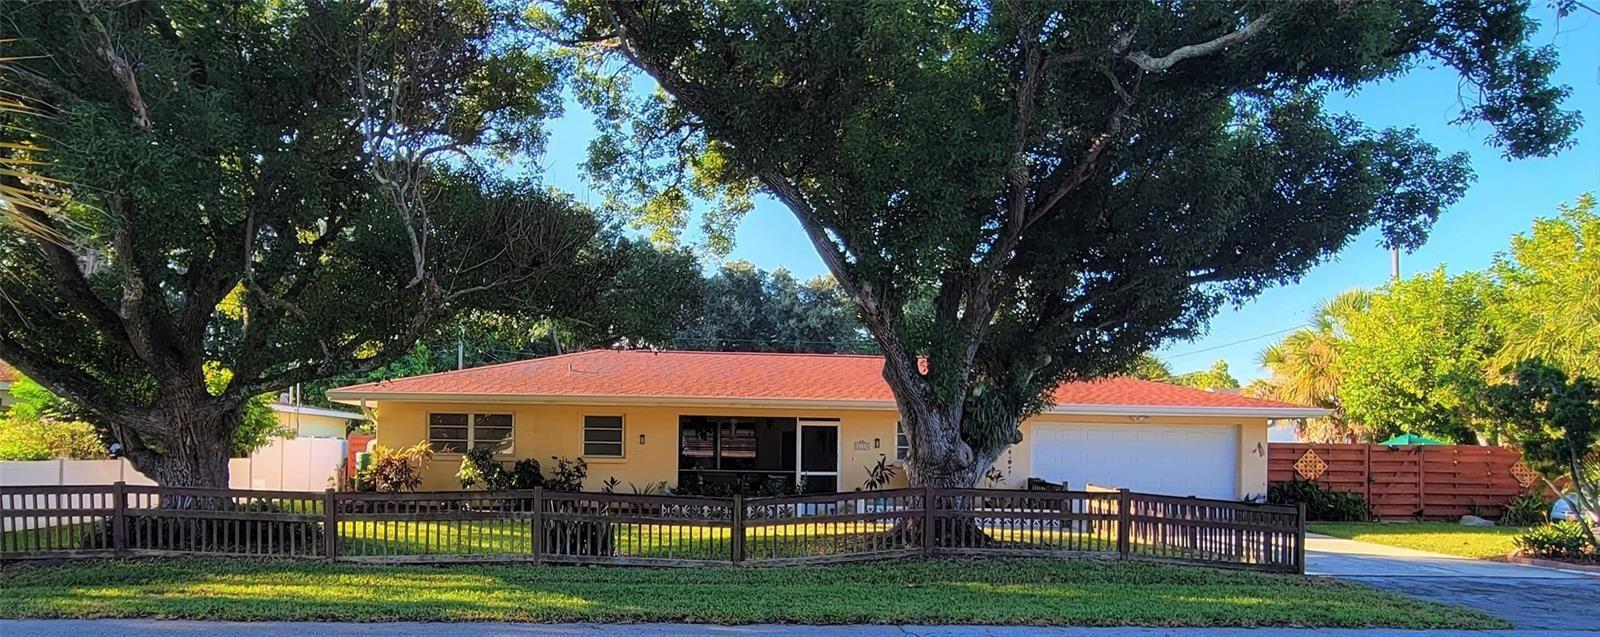 Photo of 2110 GOLDENROD STREET, SARASOTA, FL 34239 (MLS # A4514702)